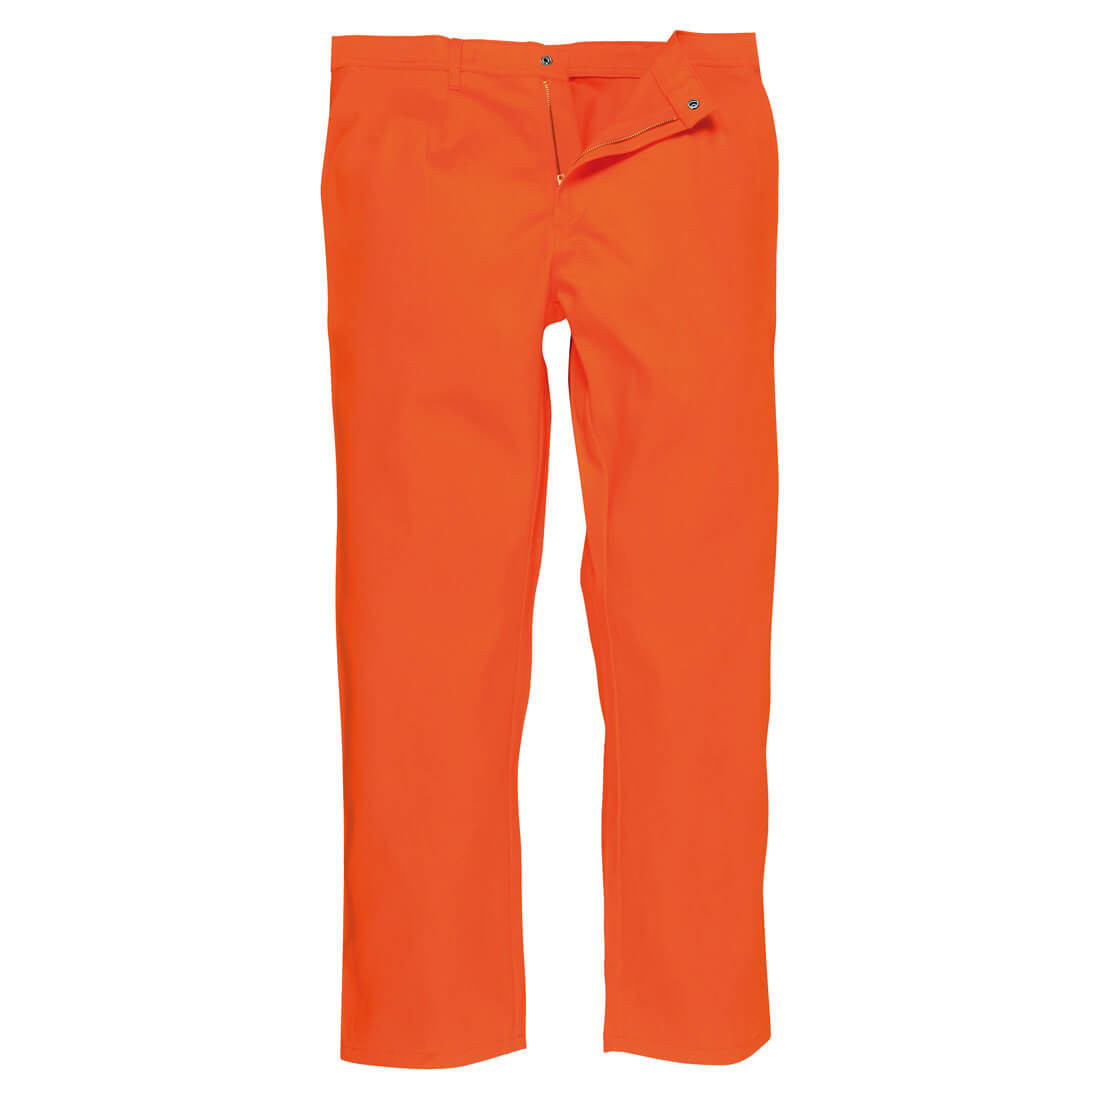 Pantaloni Bizweld - Imbracaminte de protectie